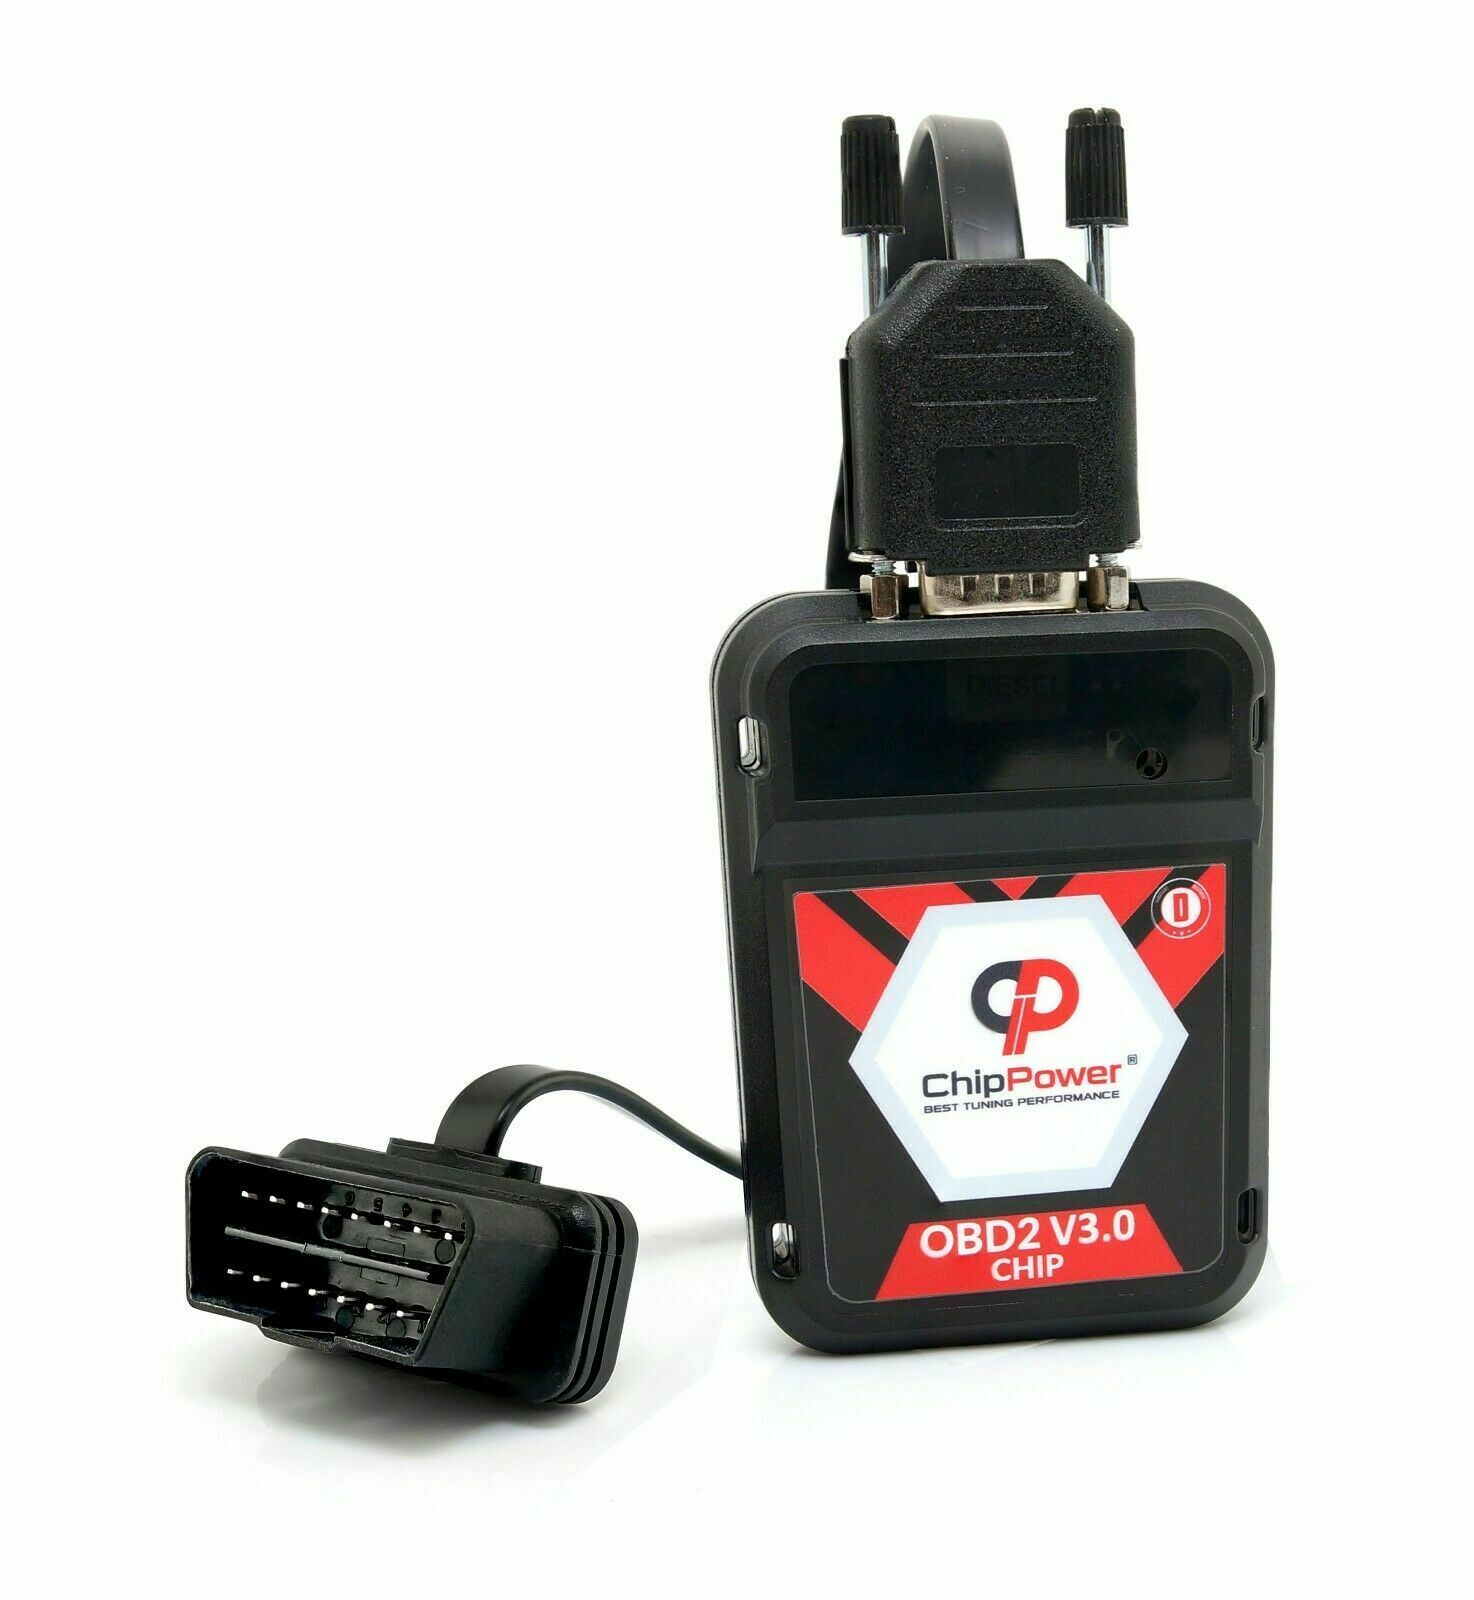 Centralina Aggiuntiva ChipPower CR1 per Tipo 1.6 D 120 CV Chip Diesel Box 356